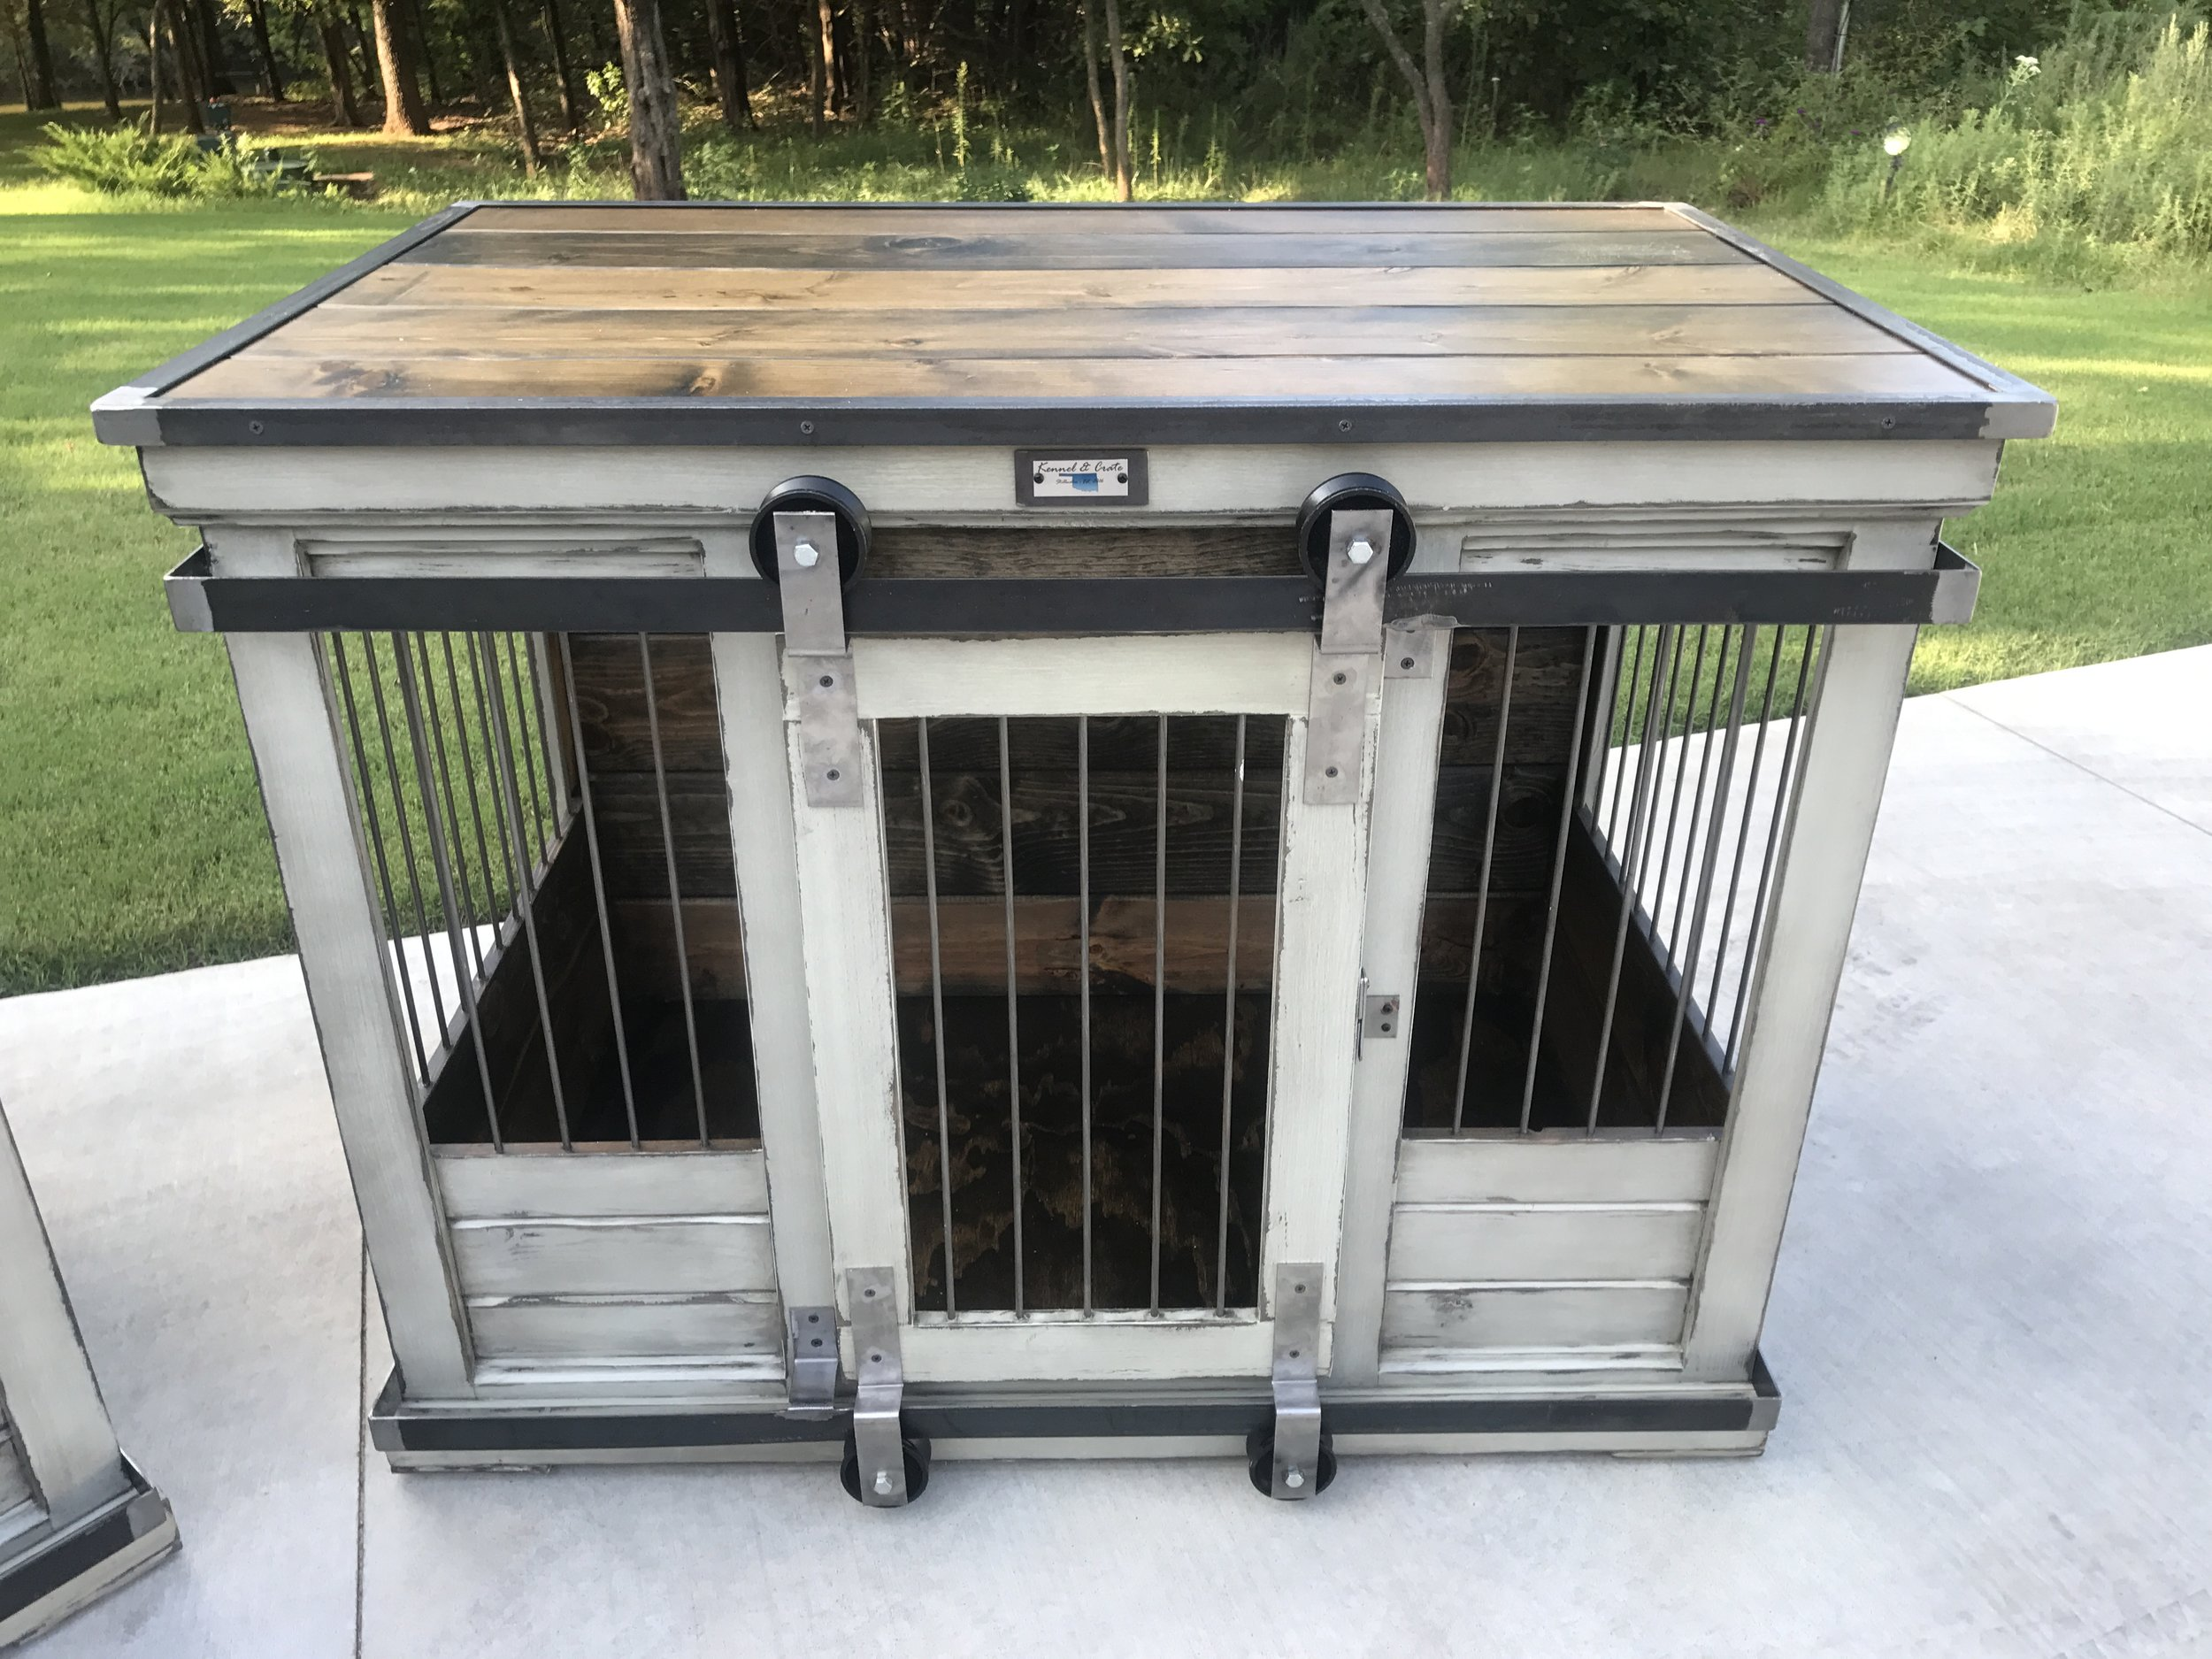 kennel  dog kennel  dog furniture  stylish kennel  dog kennel furniture  dog kennel dresser  kennel tv stand  custom dog kennel  okc dog kennels  stillwater custom kennels